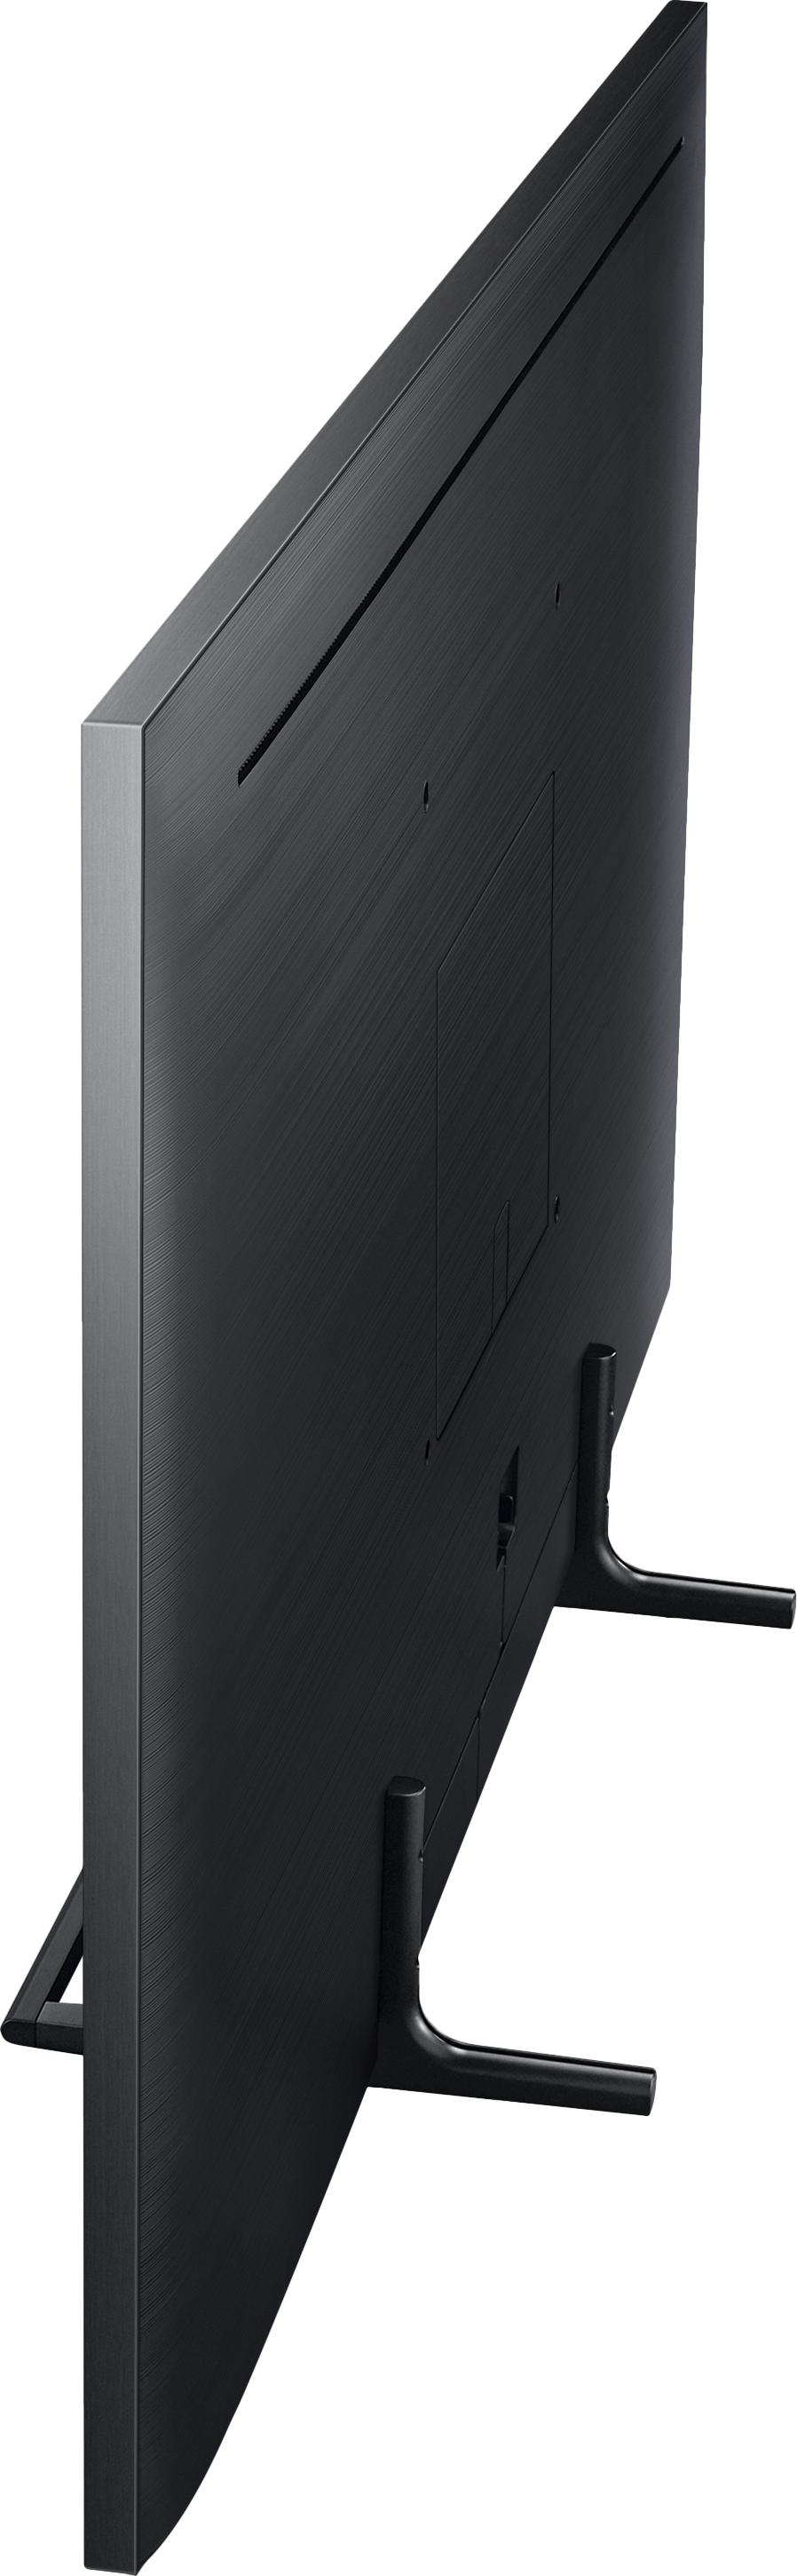 Image 8 for Samsung QN75Q9FNAFXZA